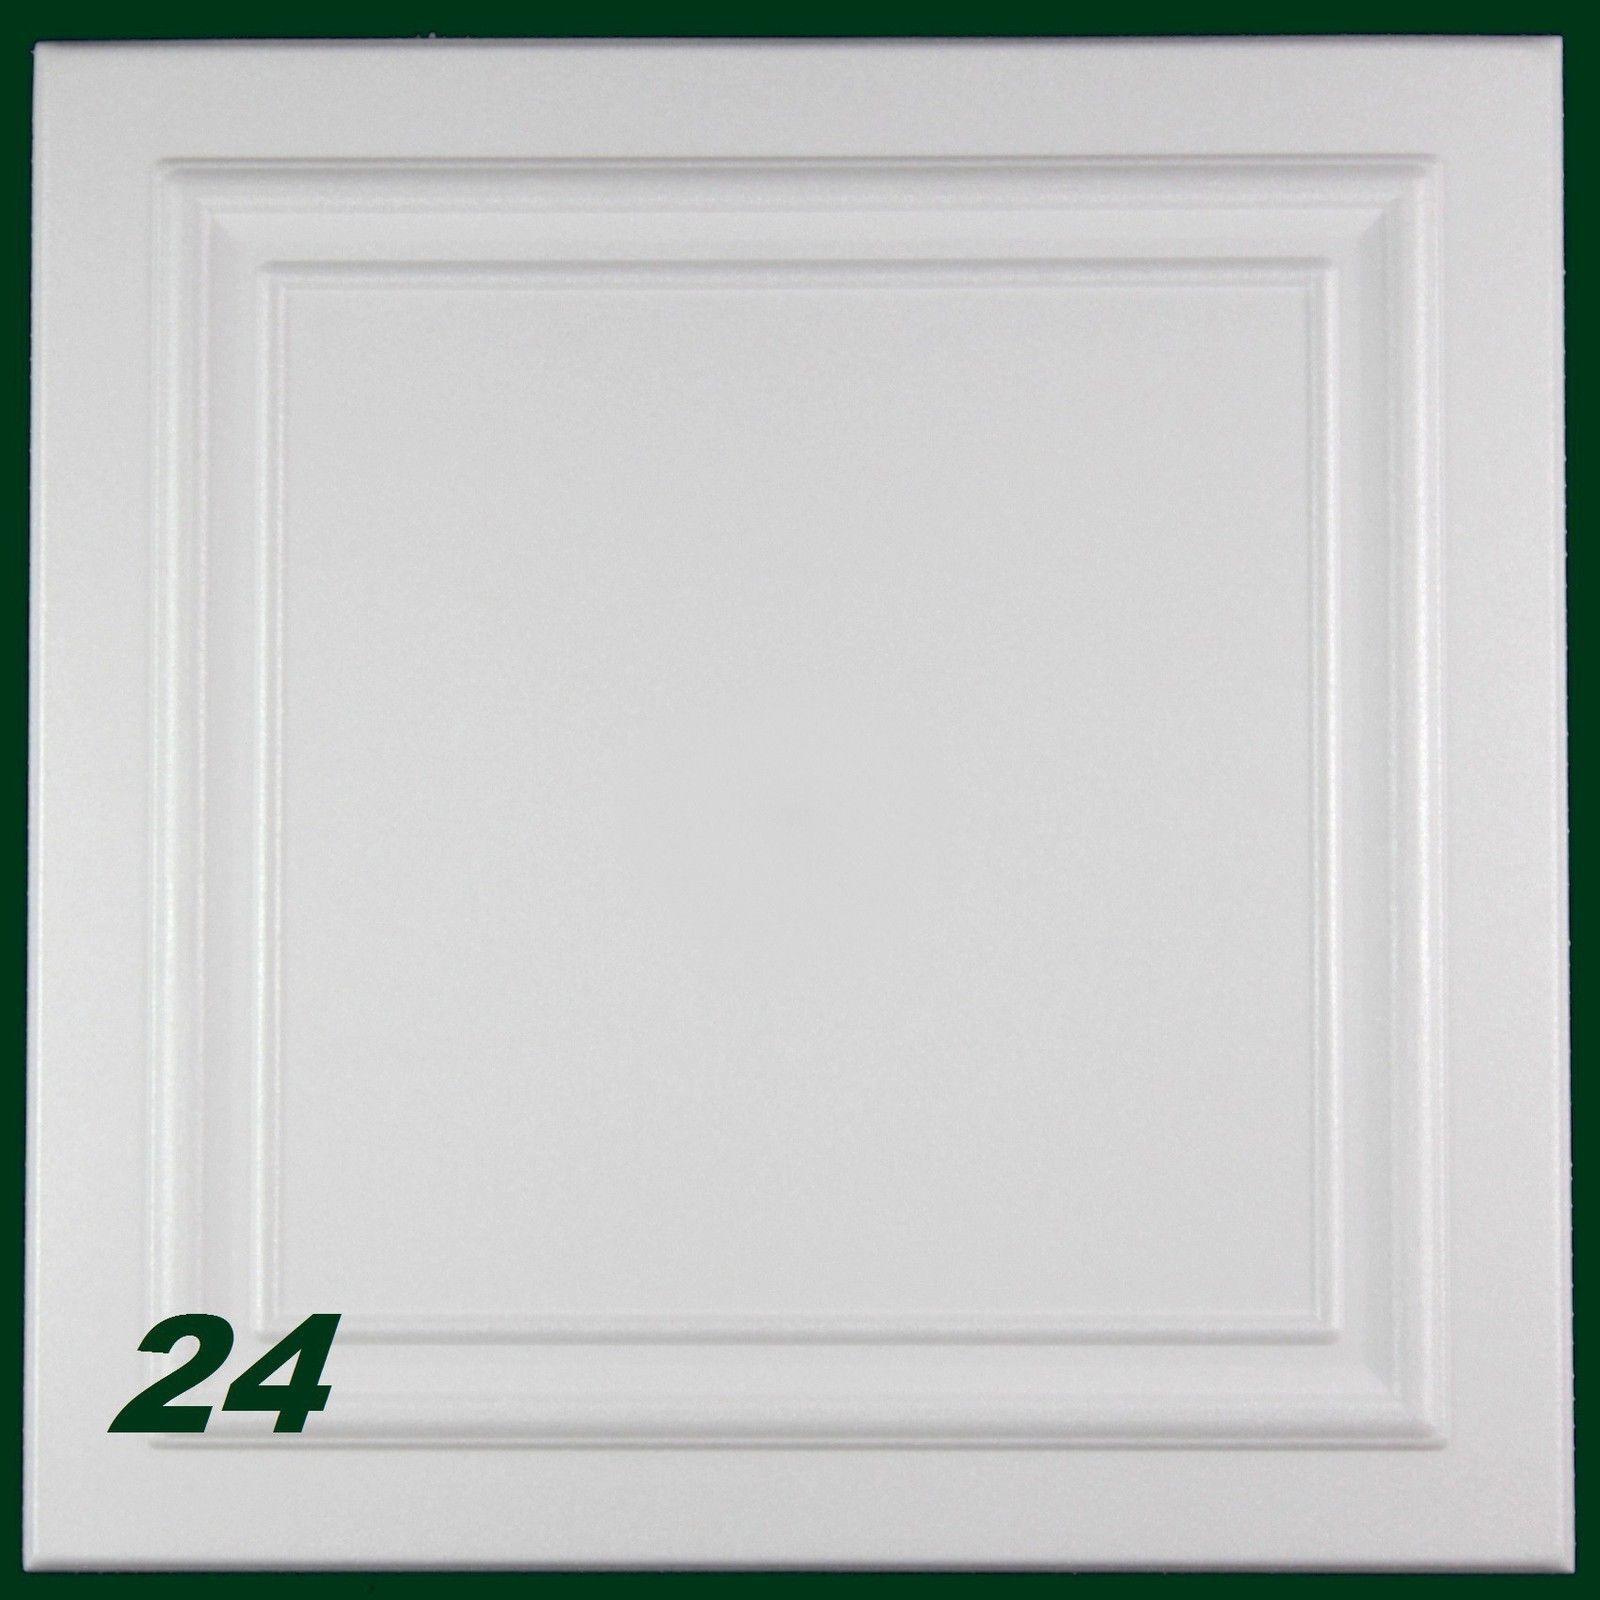 20 qm Styroporplatten Deckenplatten Stuck Platten Dekor Decke 50x50cm Nr.75